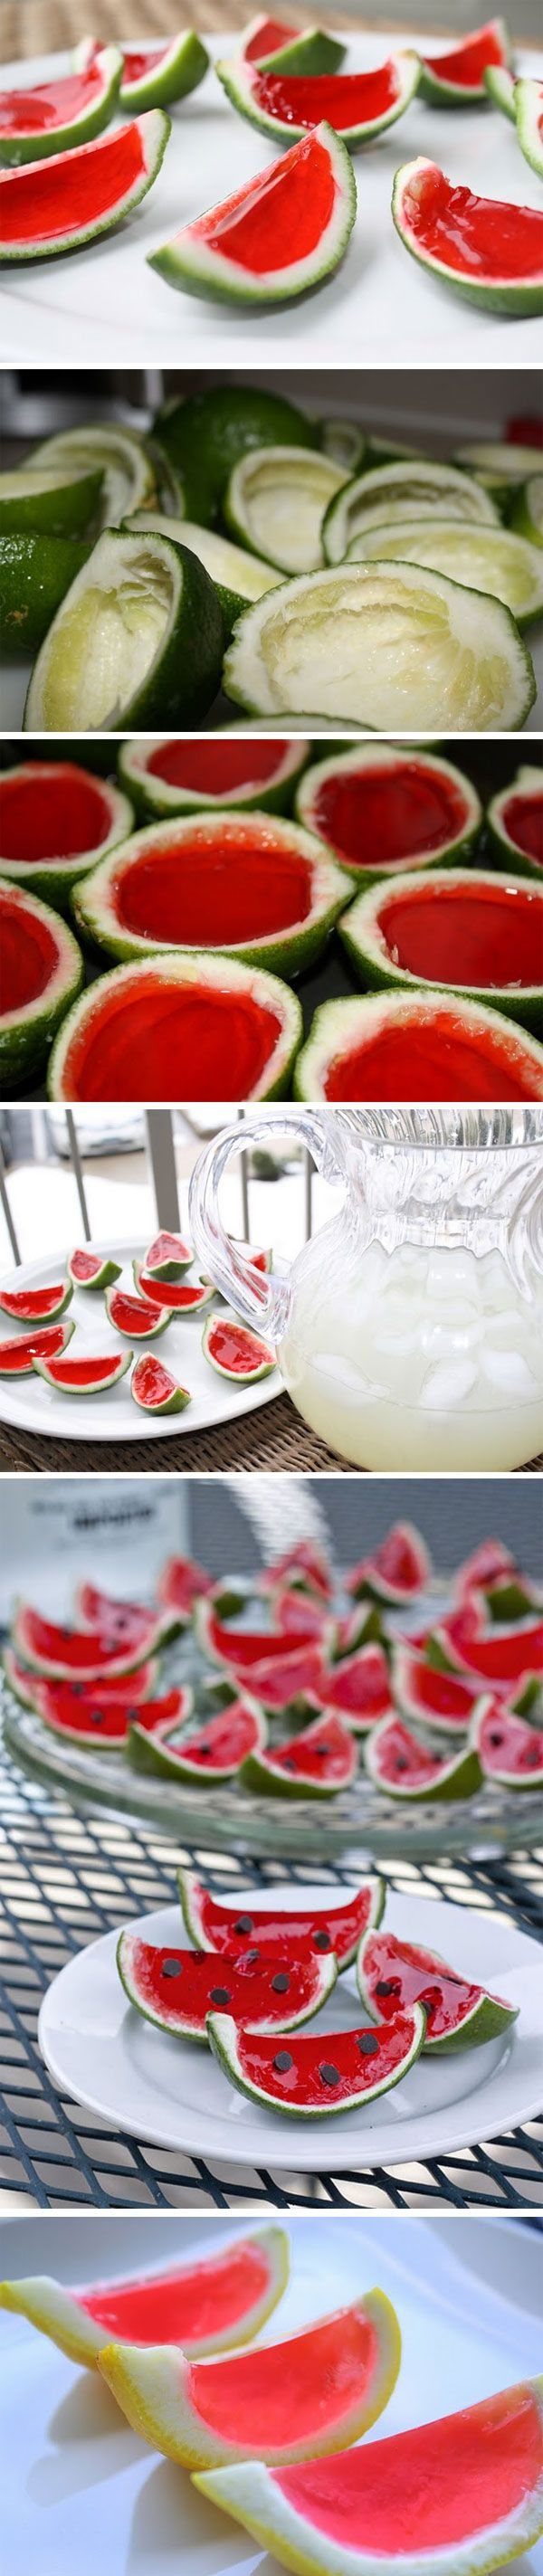 Jelly watermelon shots